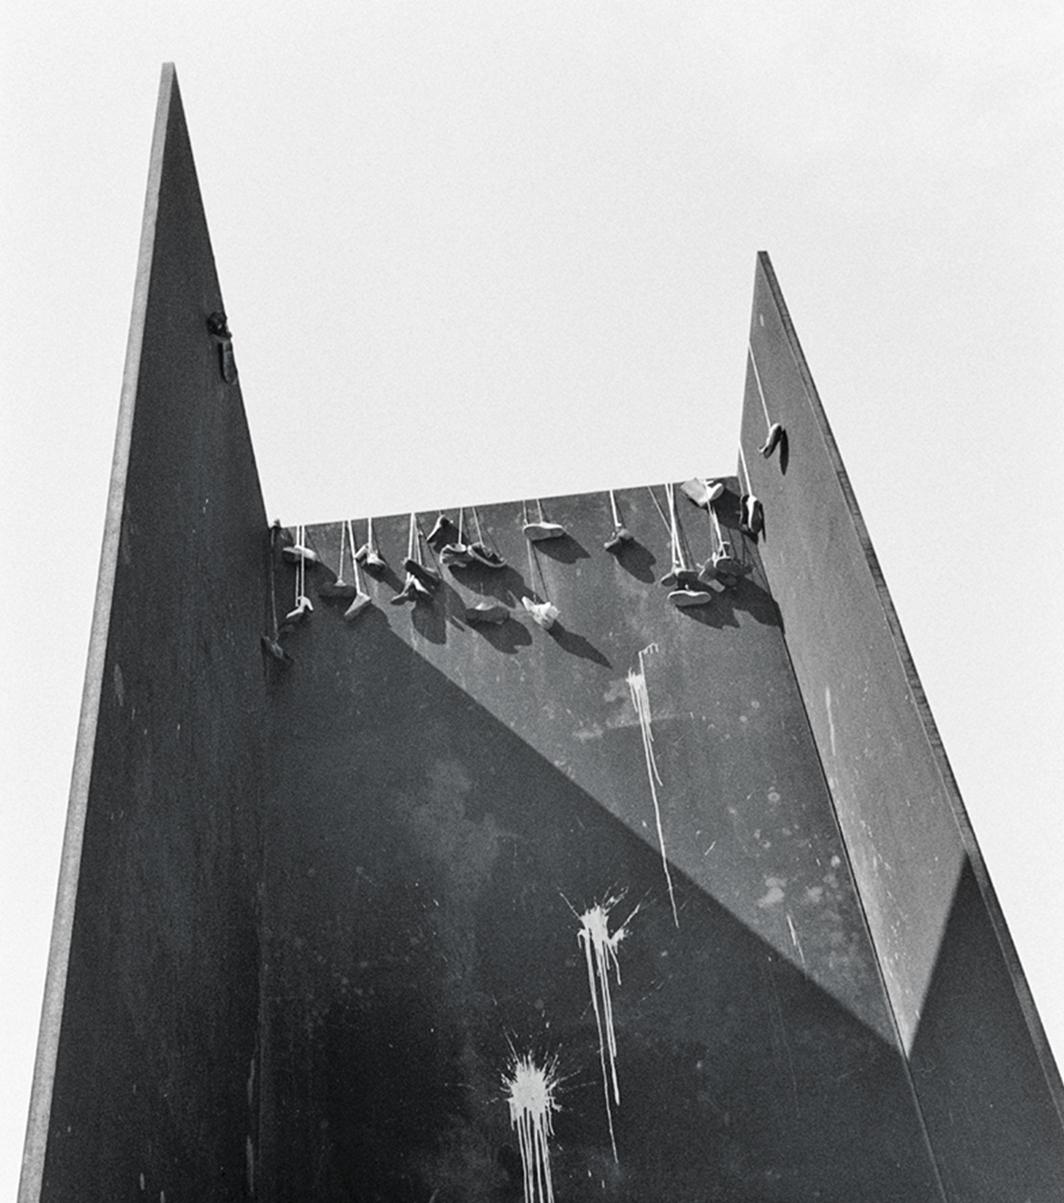 David Hammons, Shoe Tree, 1981, twenty-five pairs of sneakers, Richard Serra's T.W.U., 1980. Installation view, New York. Photo: Dawoud Bey.